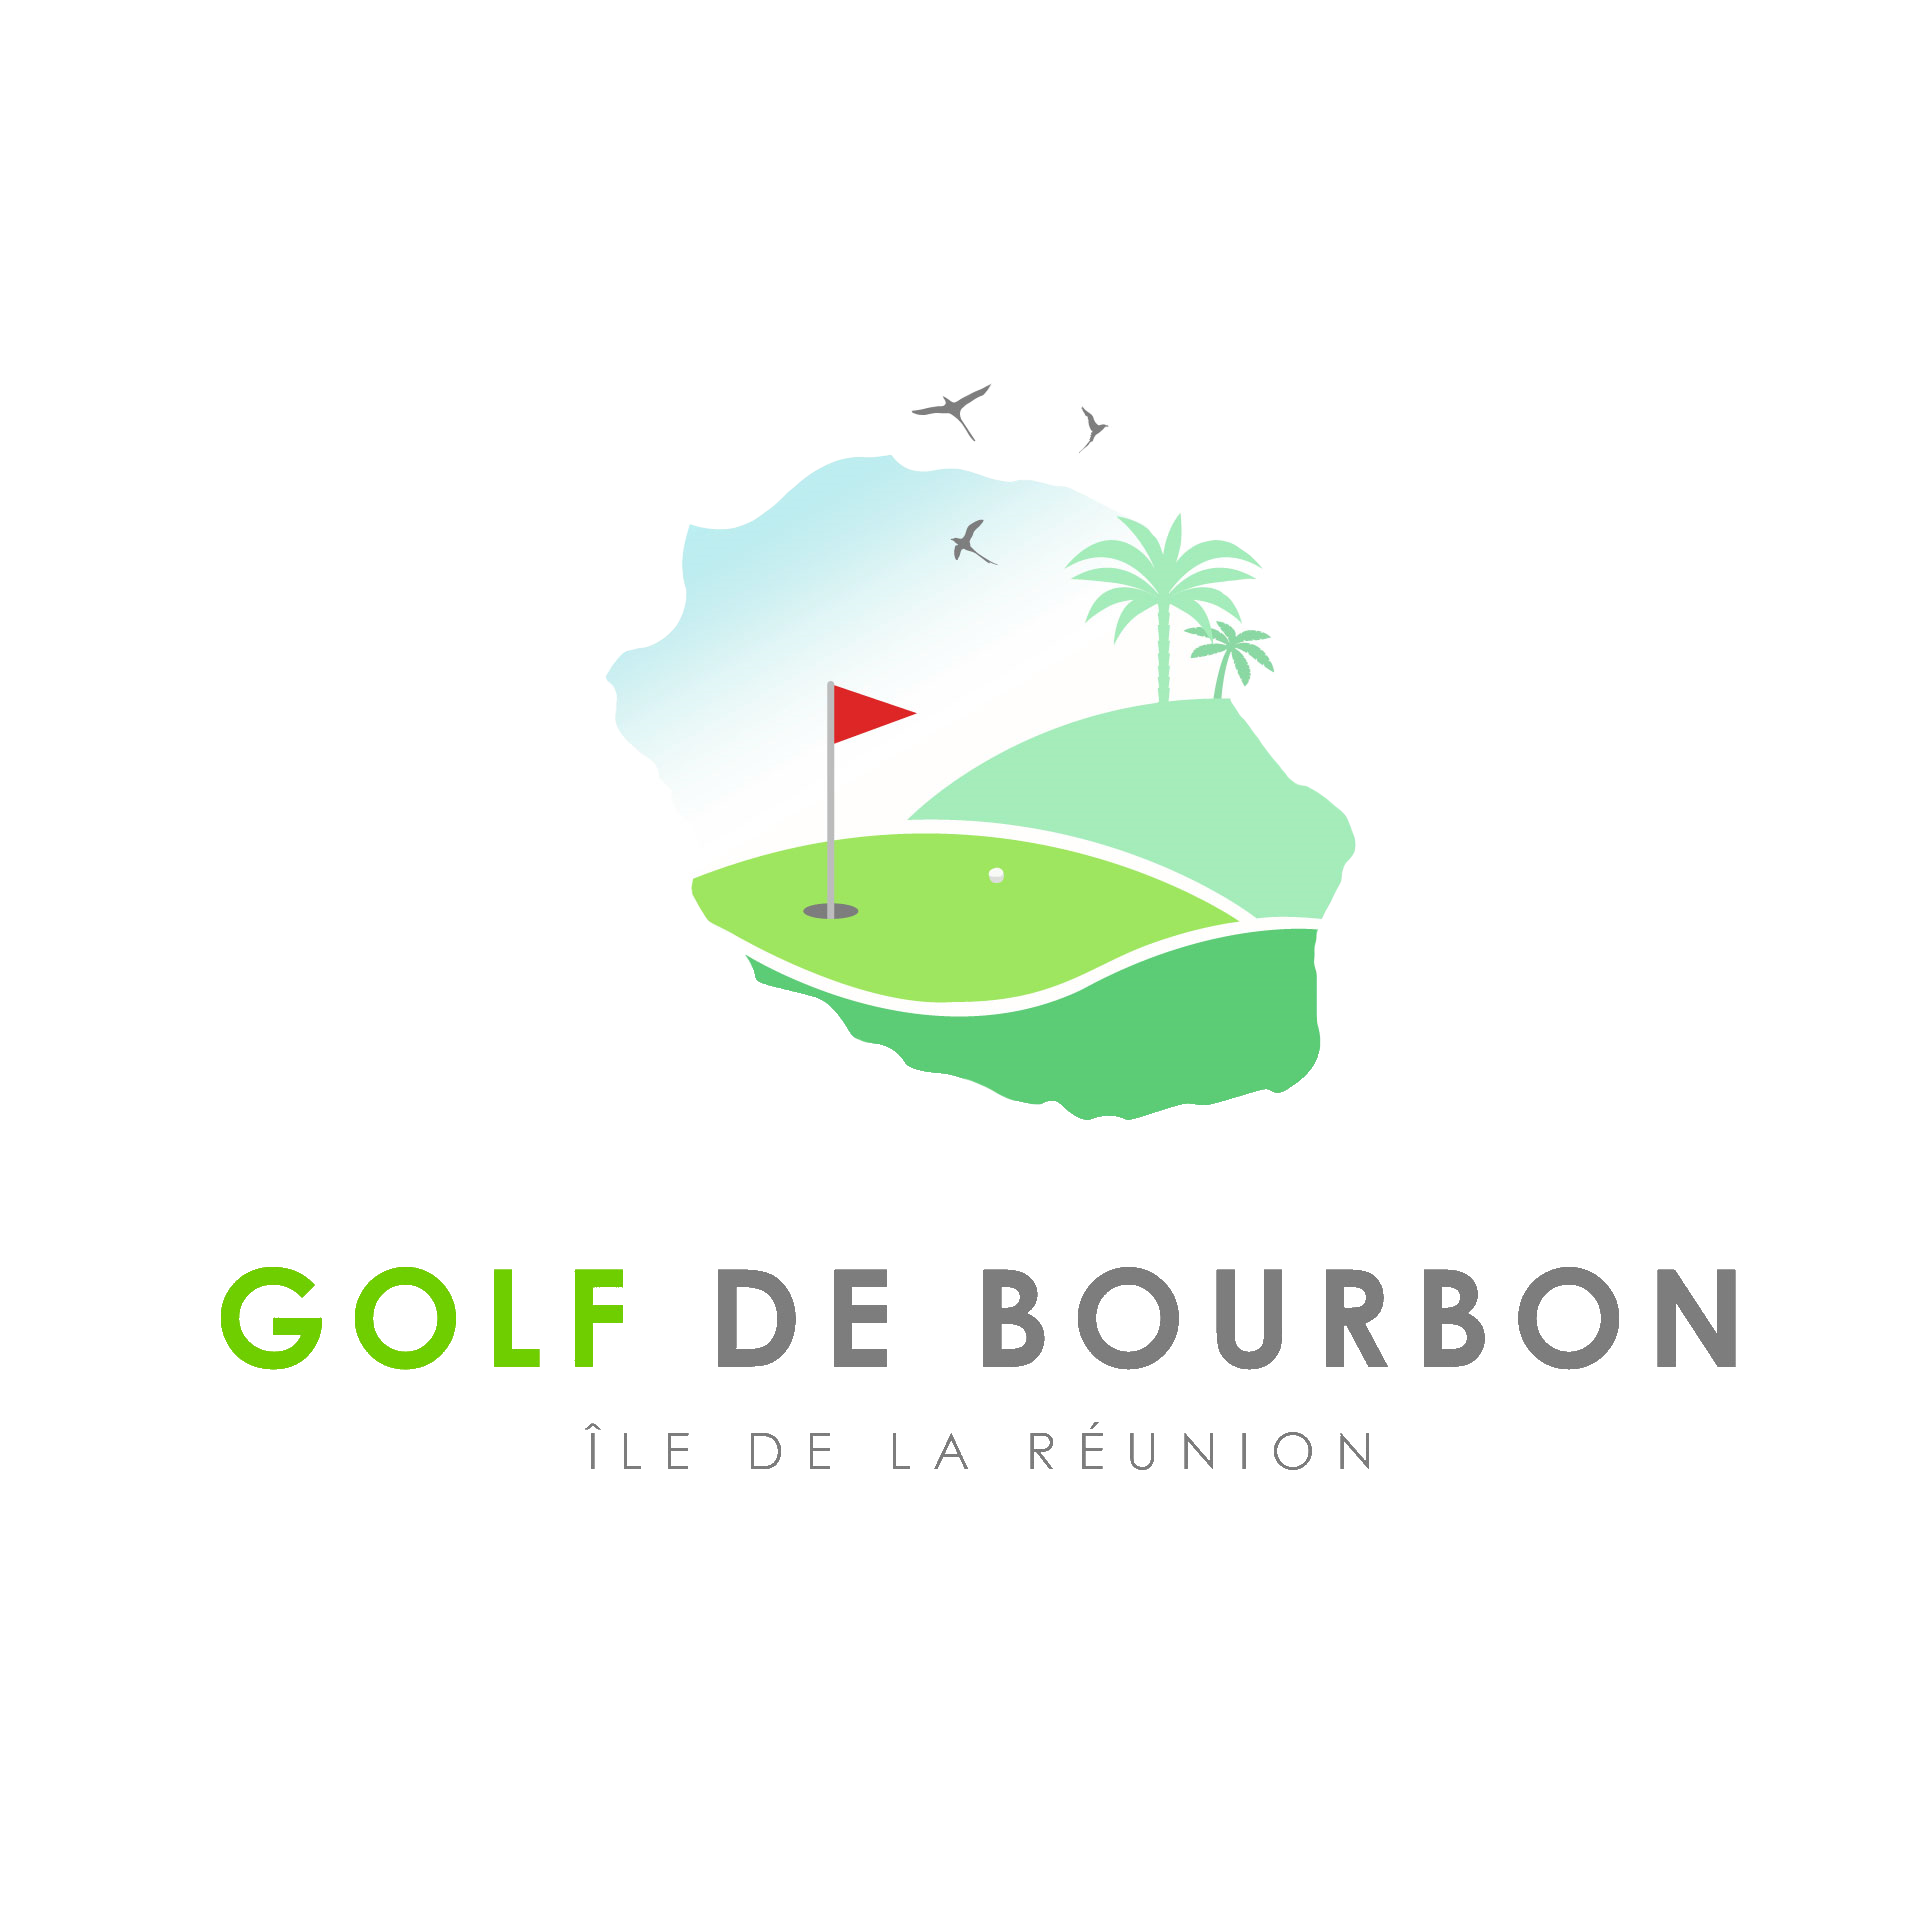 GOLF DE BOURBON